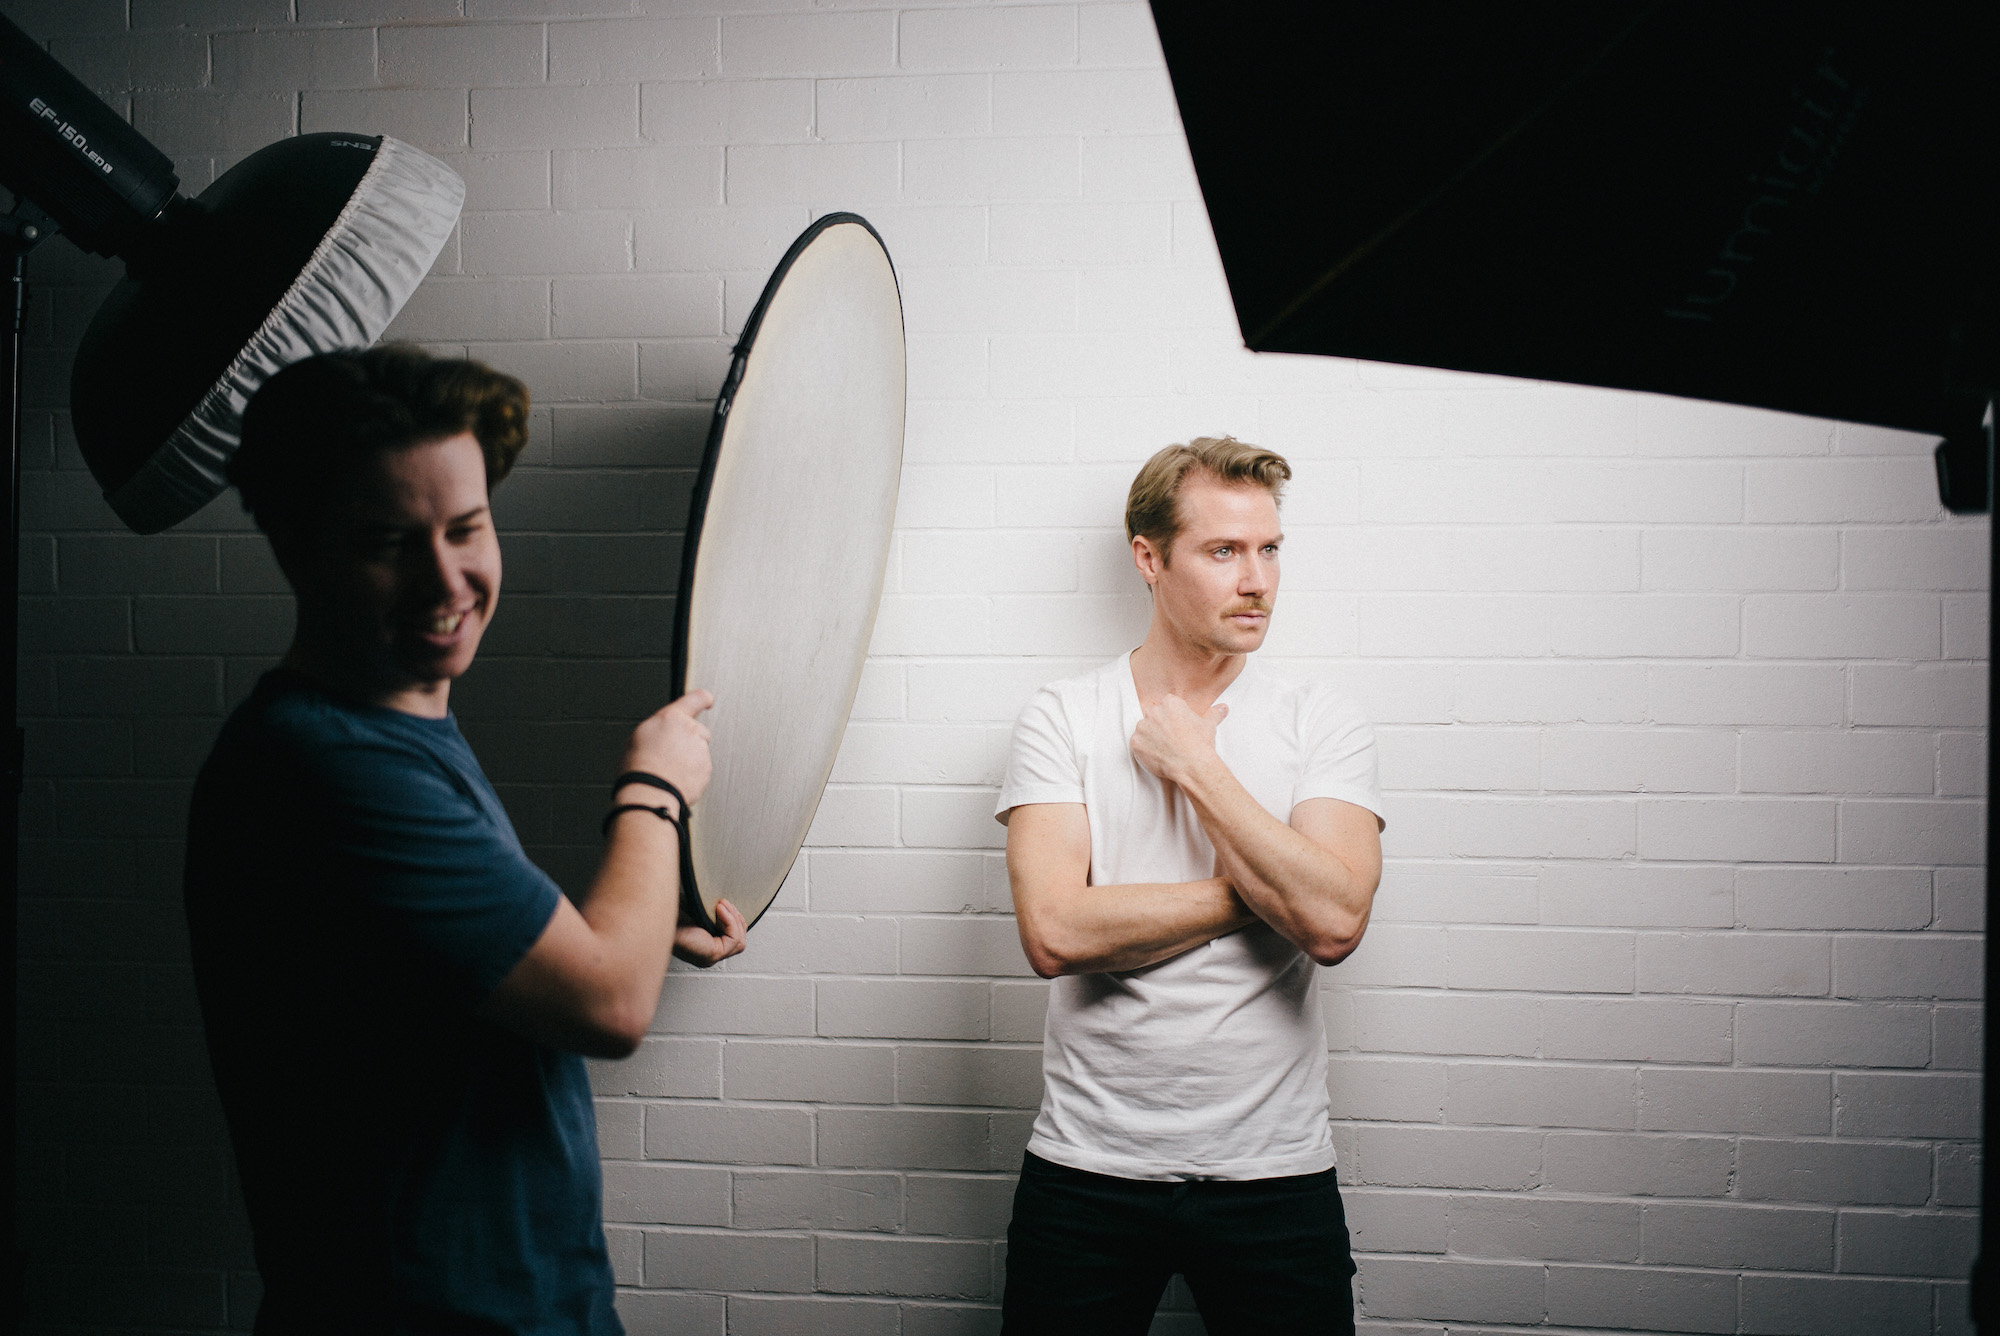 20170715__010421-Nick-Bedford,-Photographer-Leica M Typ 240, Portrait, Robin Anthony Darch, Tyler Alberti, Voigtlander 35mm F1.7 Ultron Asph, VSCO Film.jpg